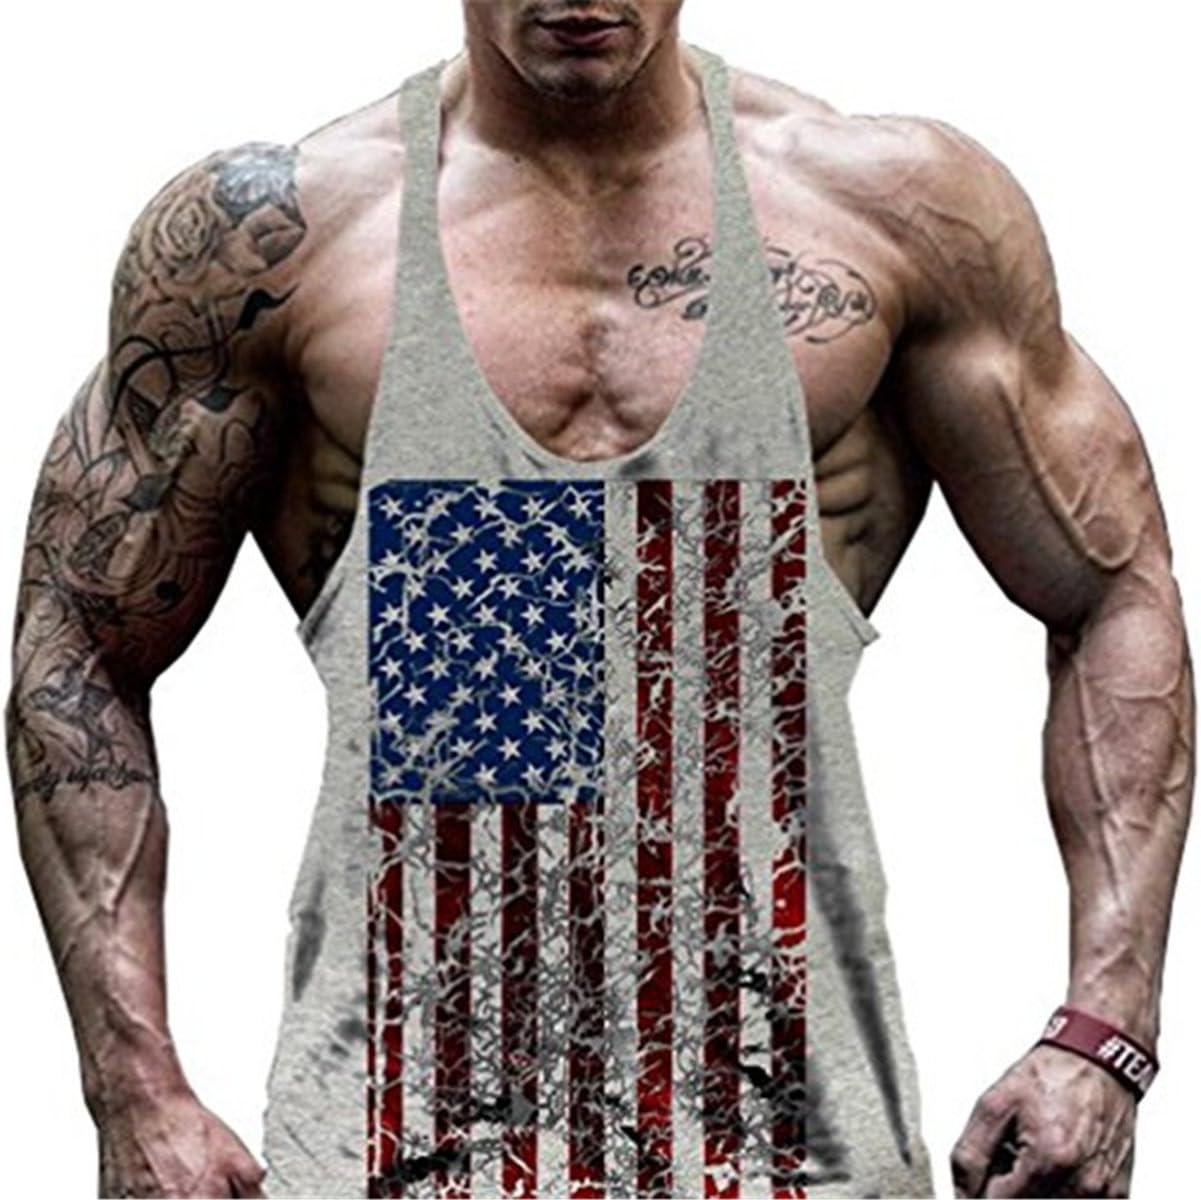 Faith Wings Hombre Fitness Gym muscular absorbente Chaleco Bodybuilding Bandera de Estados Unidos Stringer Tank Top s/ólida Sport Vest